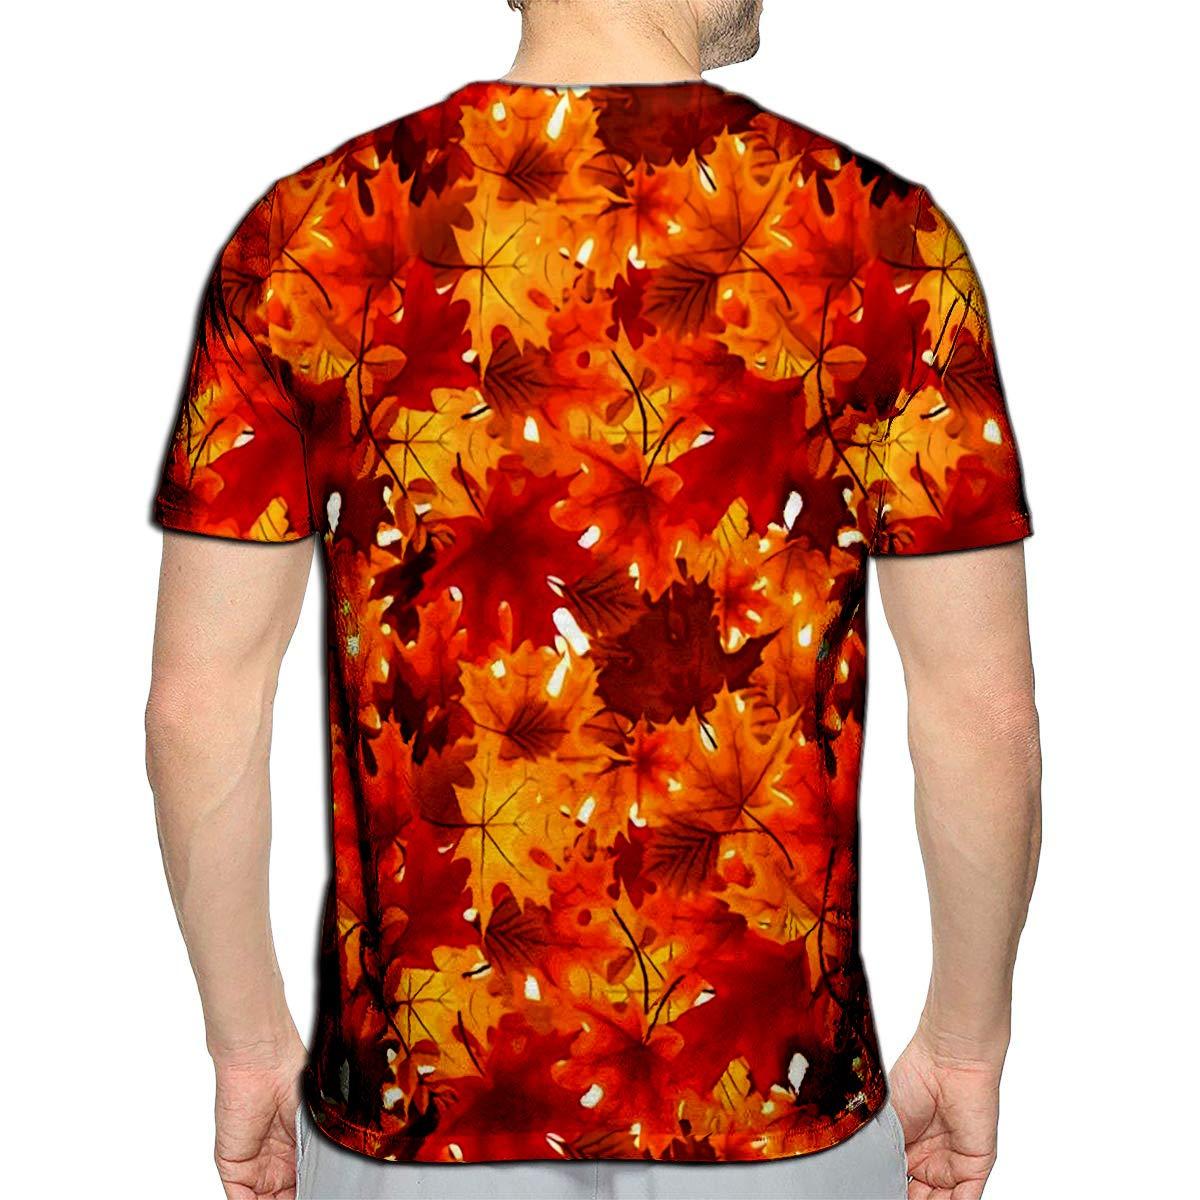 Randell 3D Printed T-Shirts Flower with Orange Design Short Sleeve Tops Tees